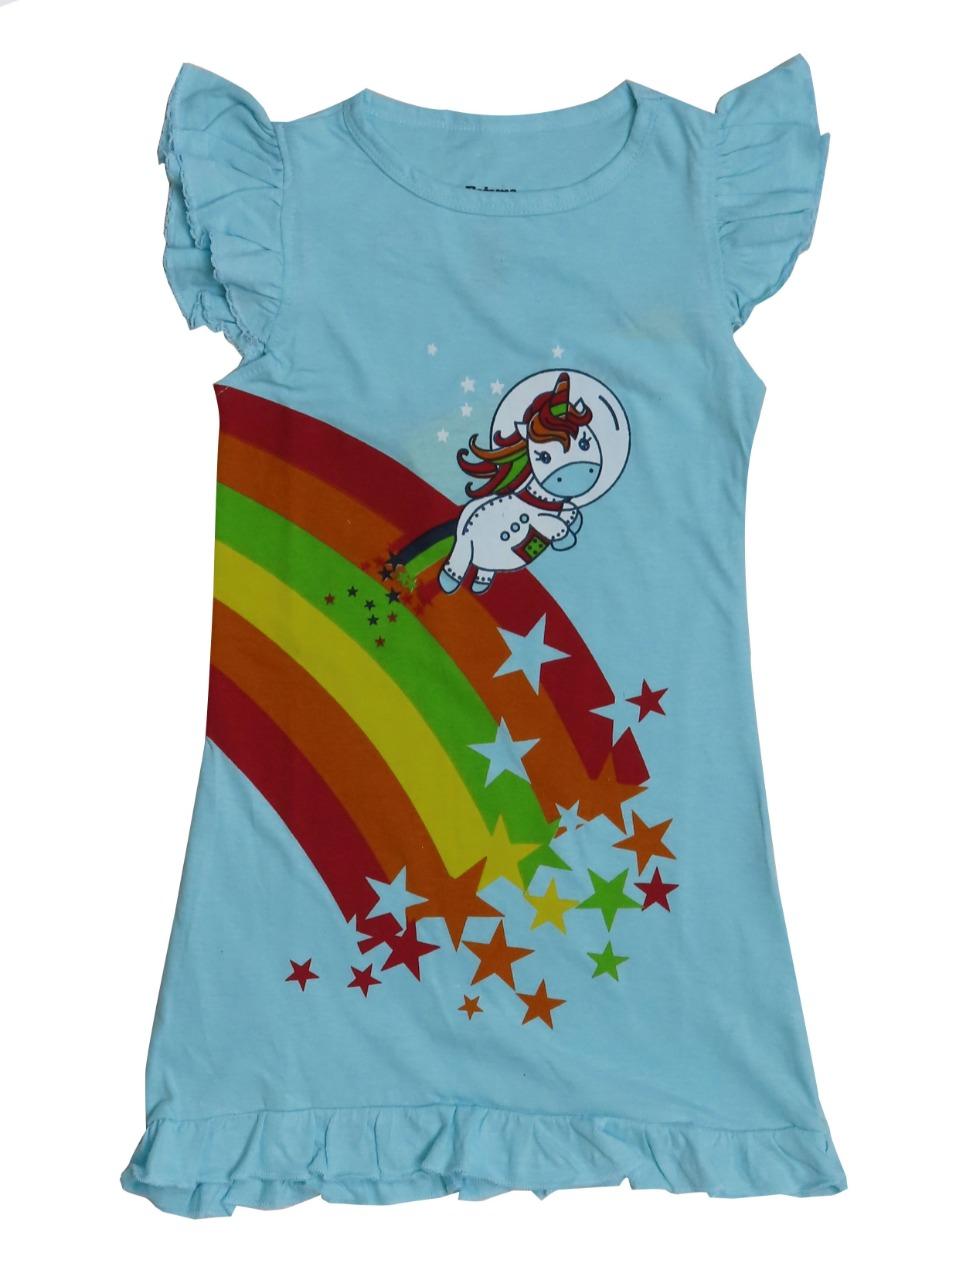 Rainbow Printed Girls  Nightshirt